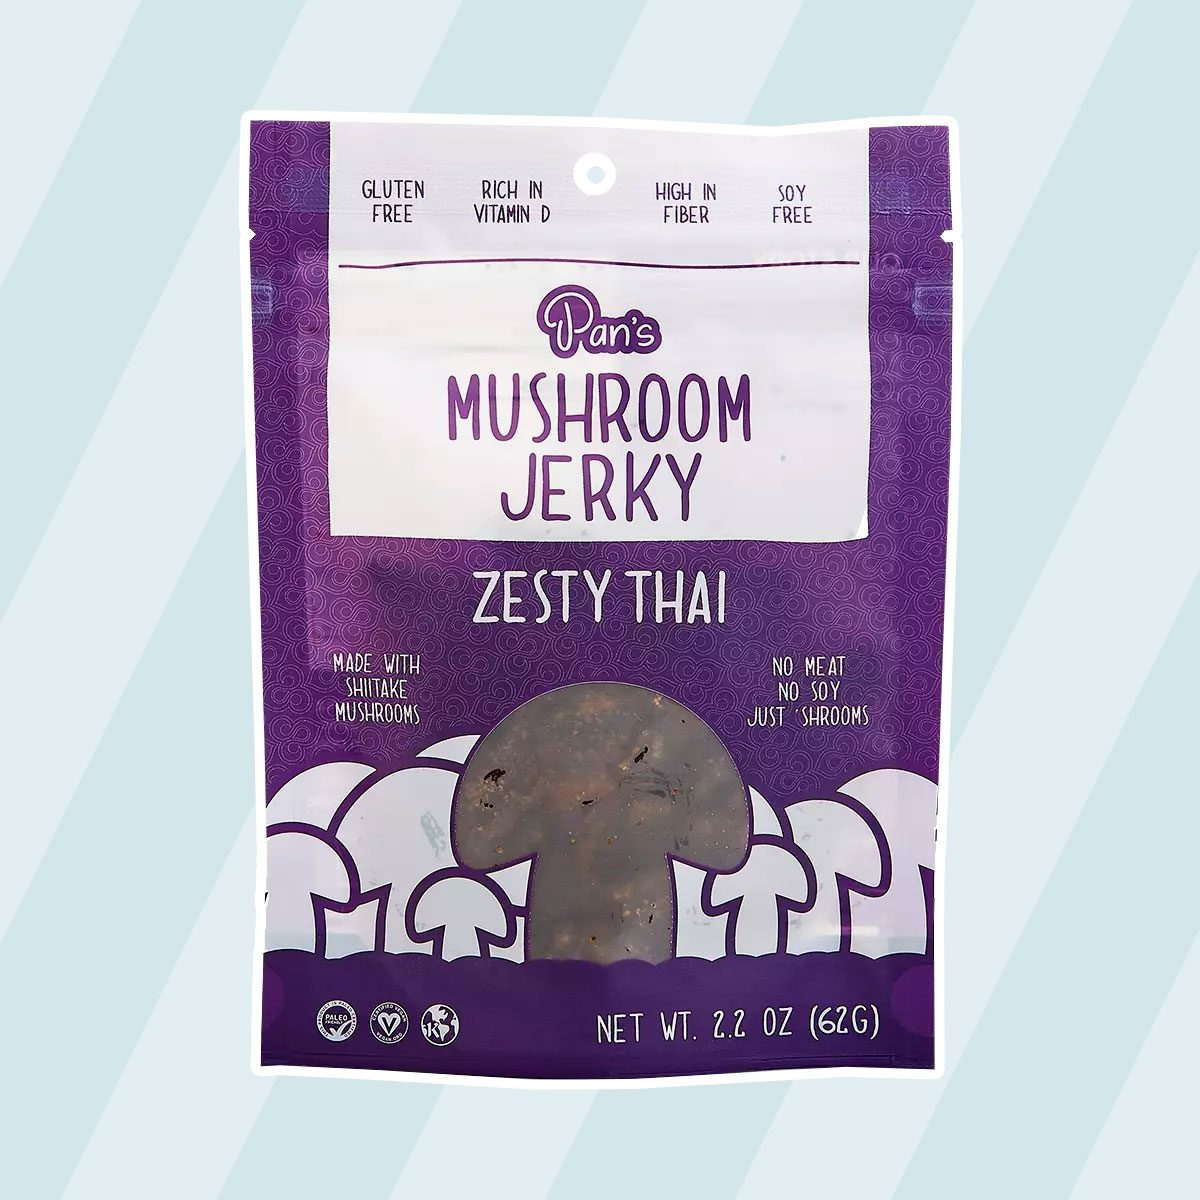 Zesty Thai Mushroom Jerky